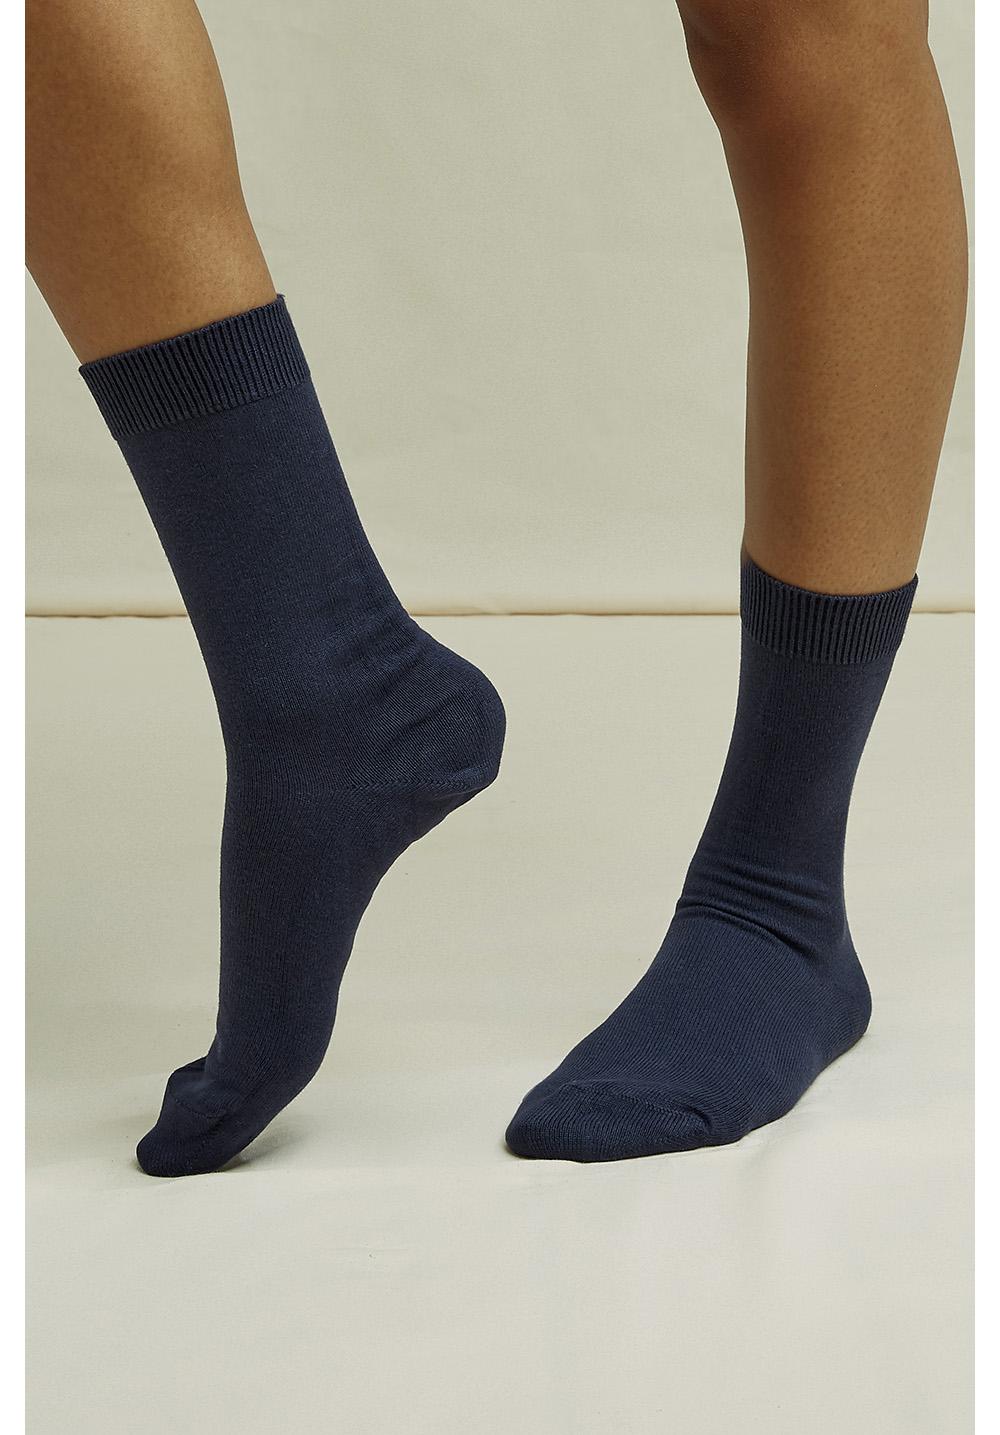 Organic Cotton Socks in Navy 35-38